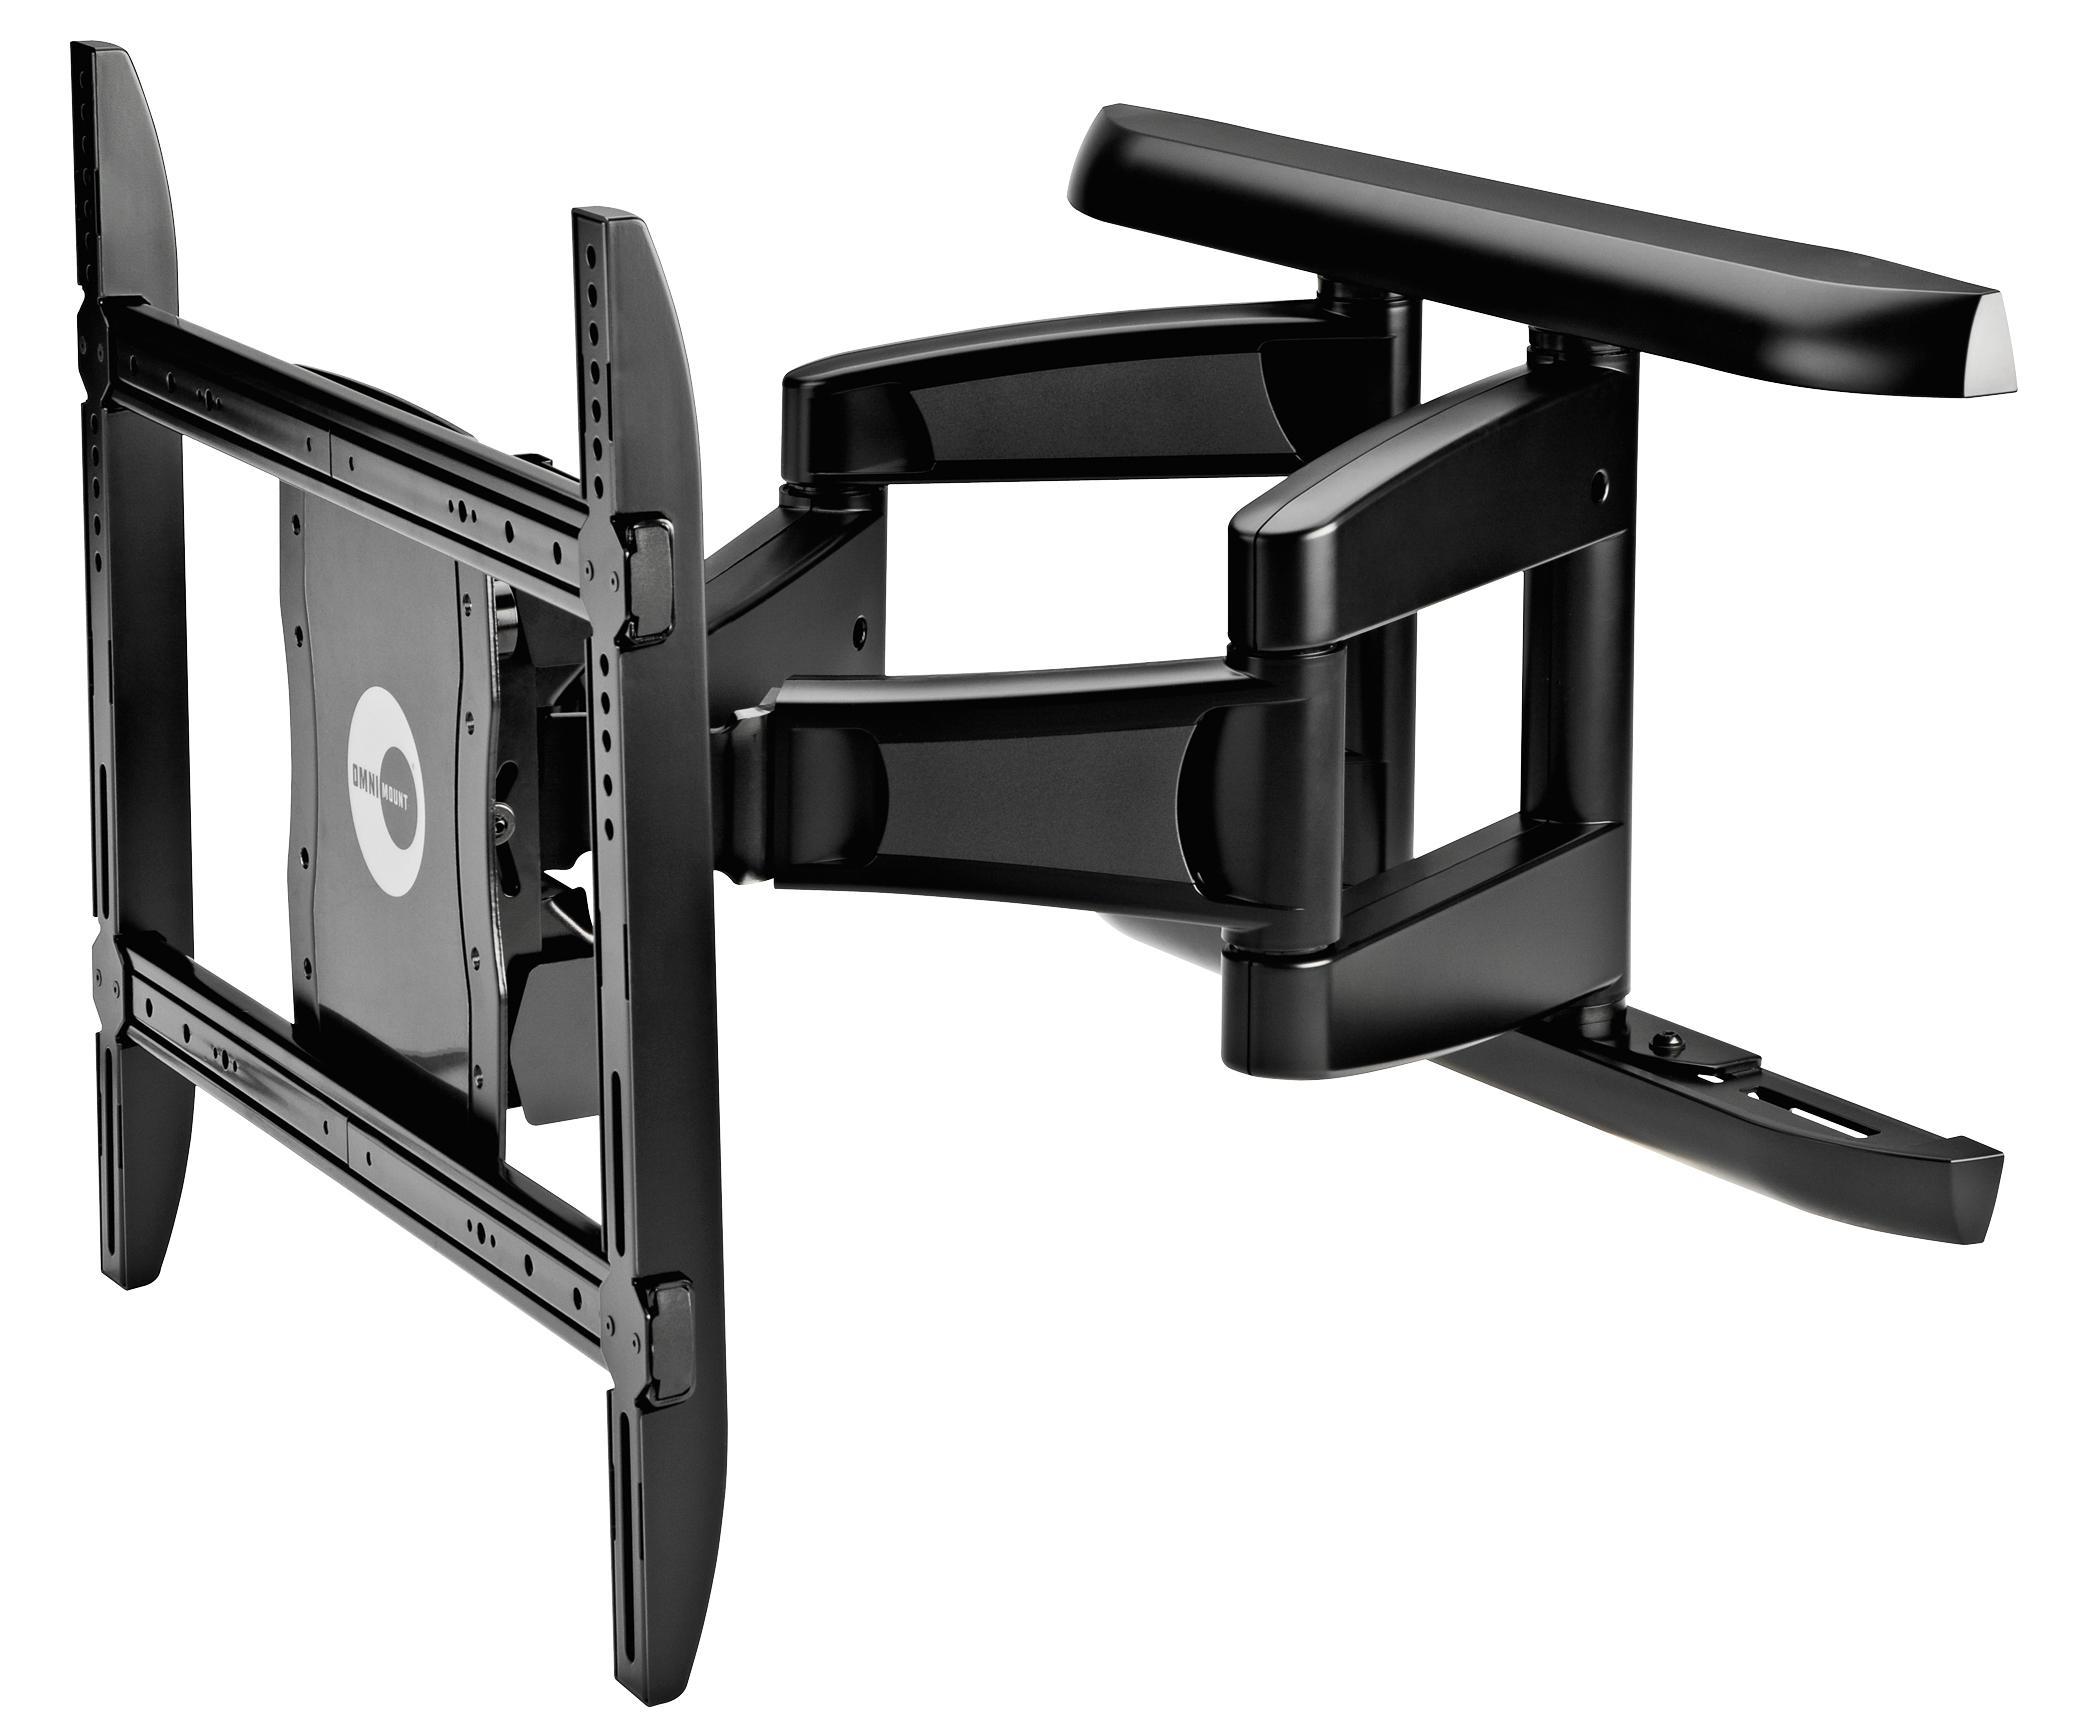 Omnimount ulpc x b ultra low profile motion - Vertical sliding tv wall mount ...